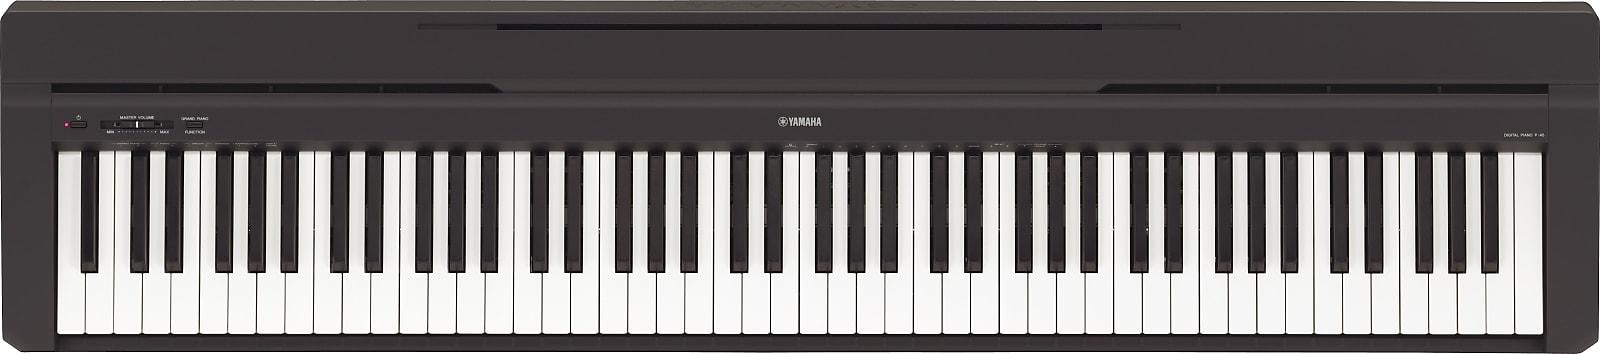 Yamaha P-45 88-Key Digital Piano w/ Stand- Black 2019